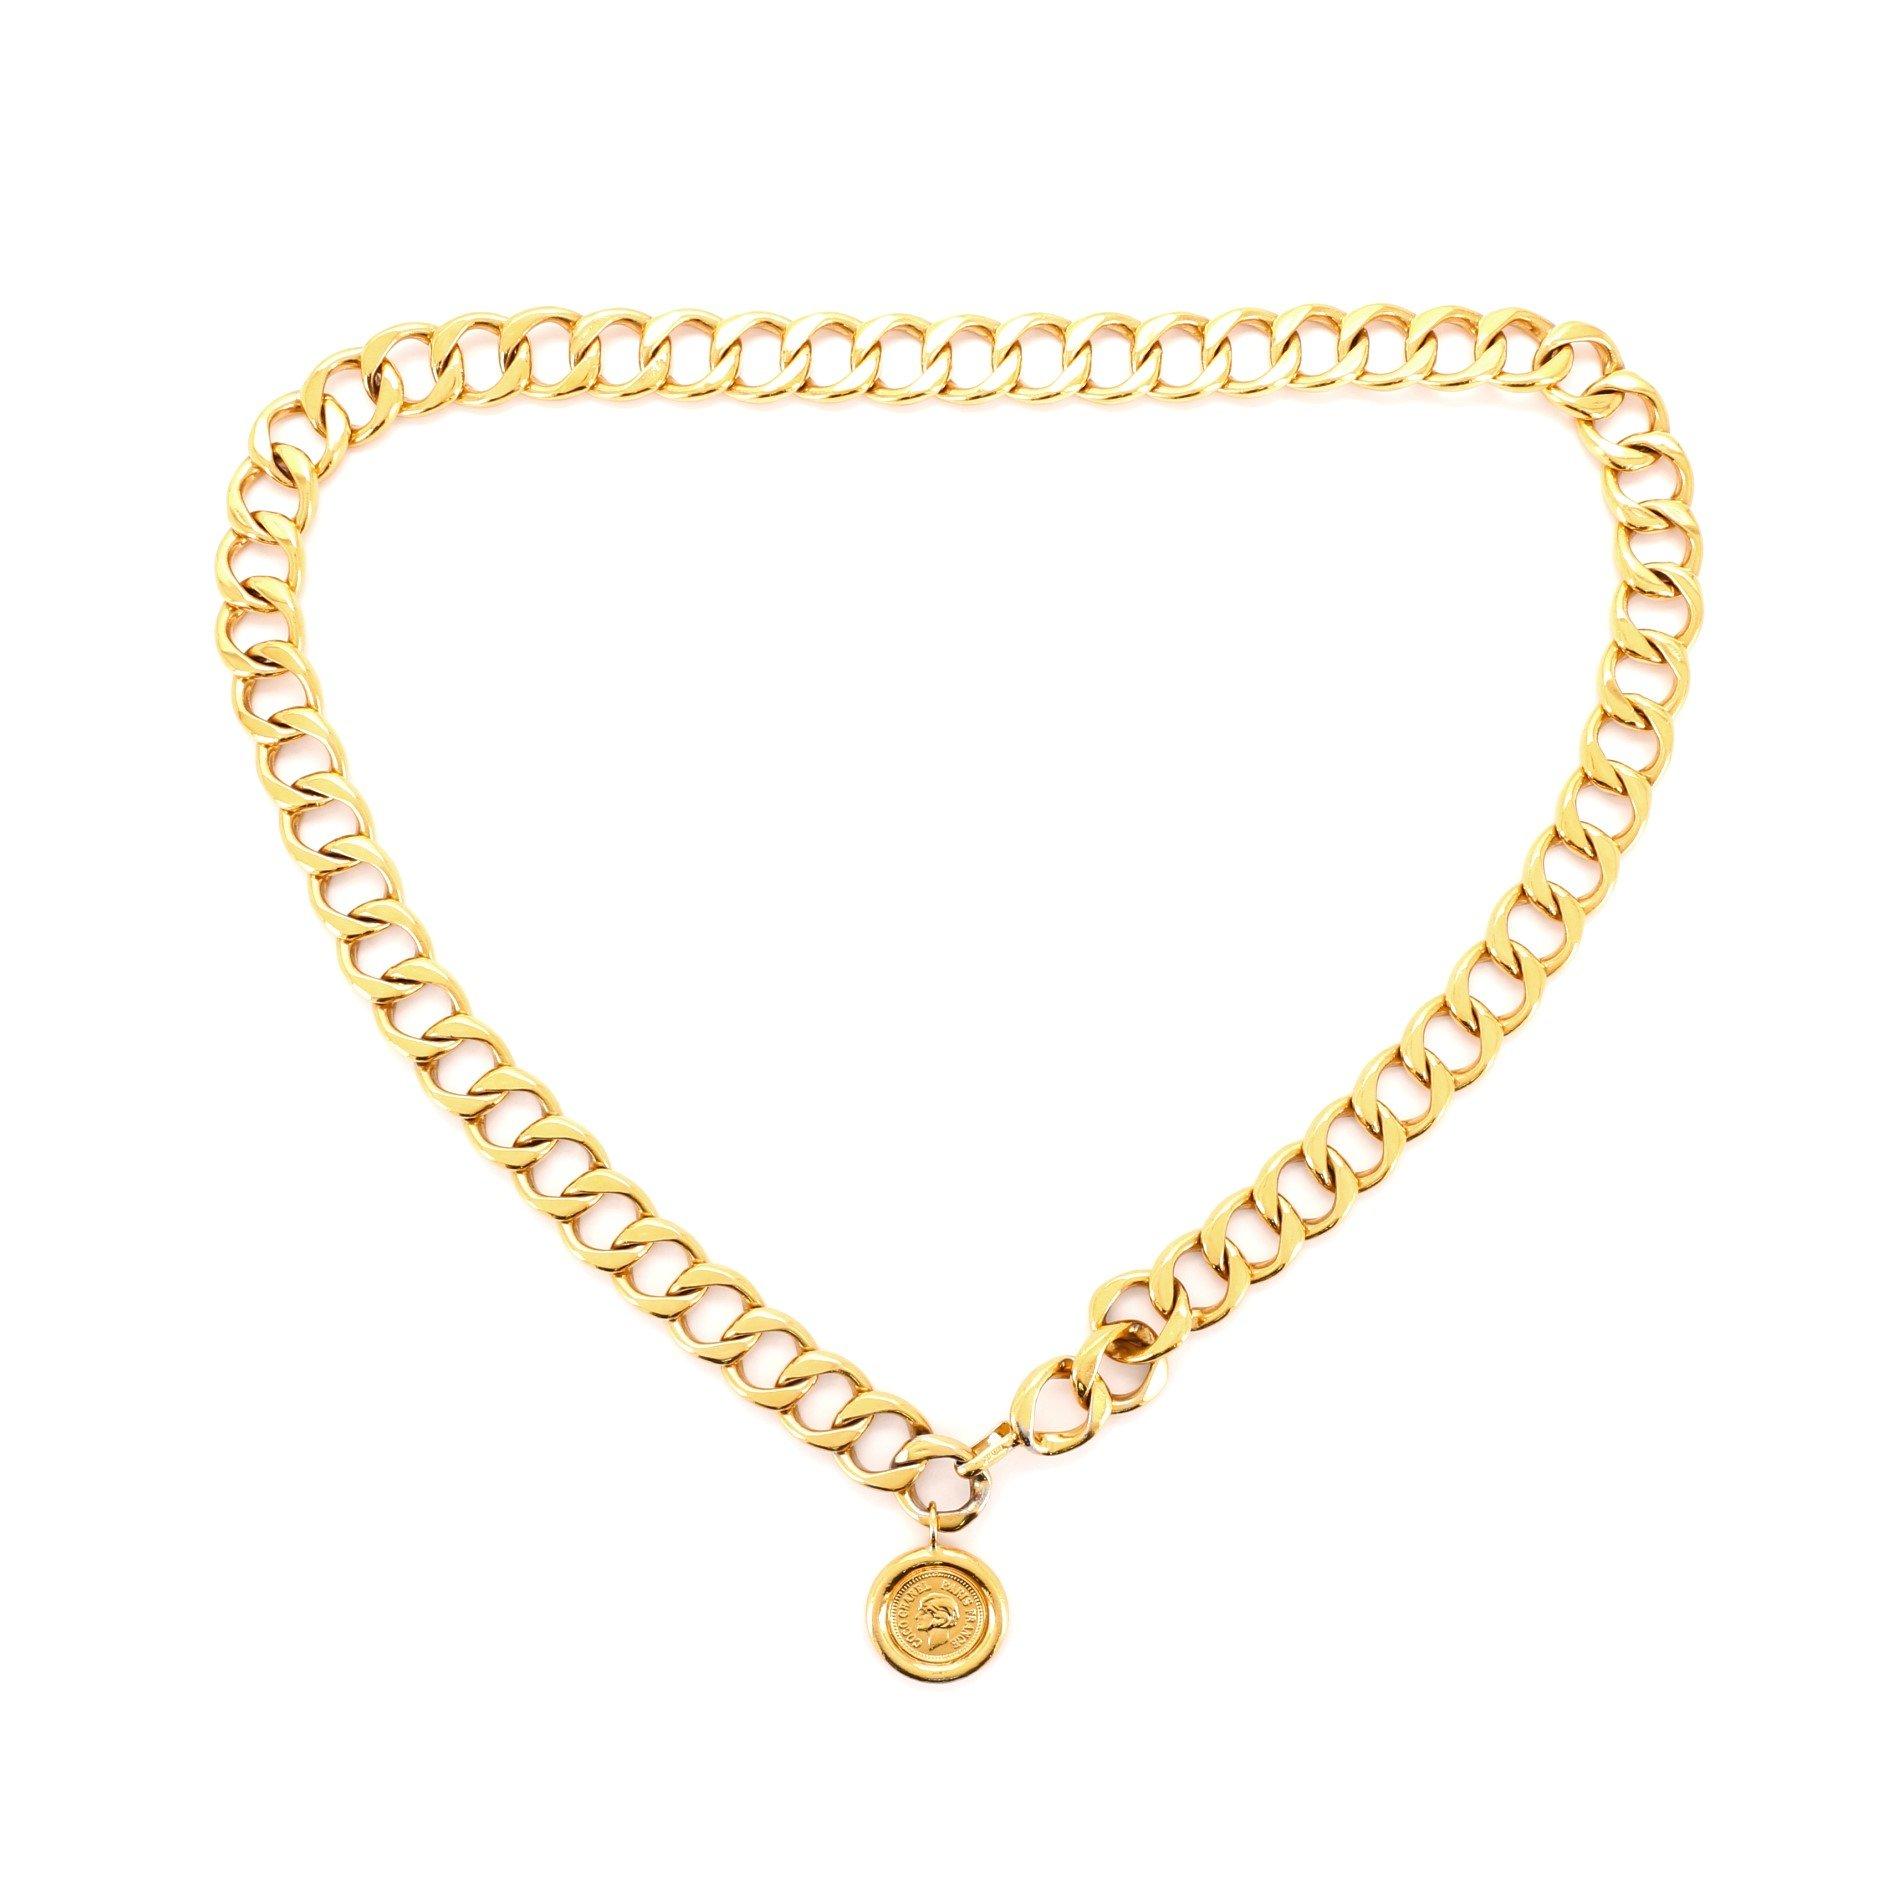 Chanel Vintage Medallion Chain Belt Metal 100